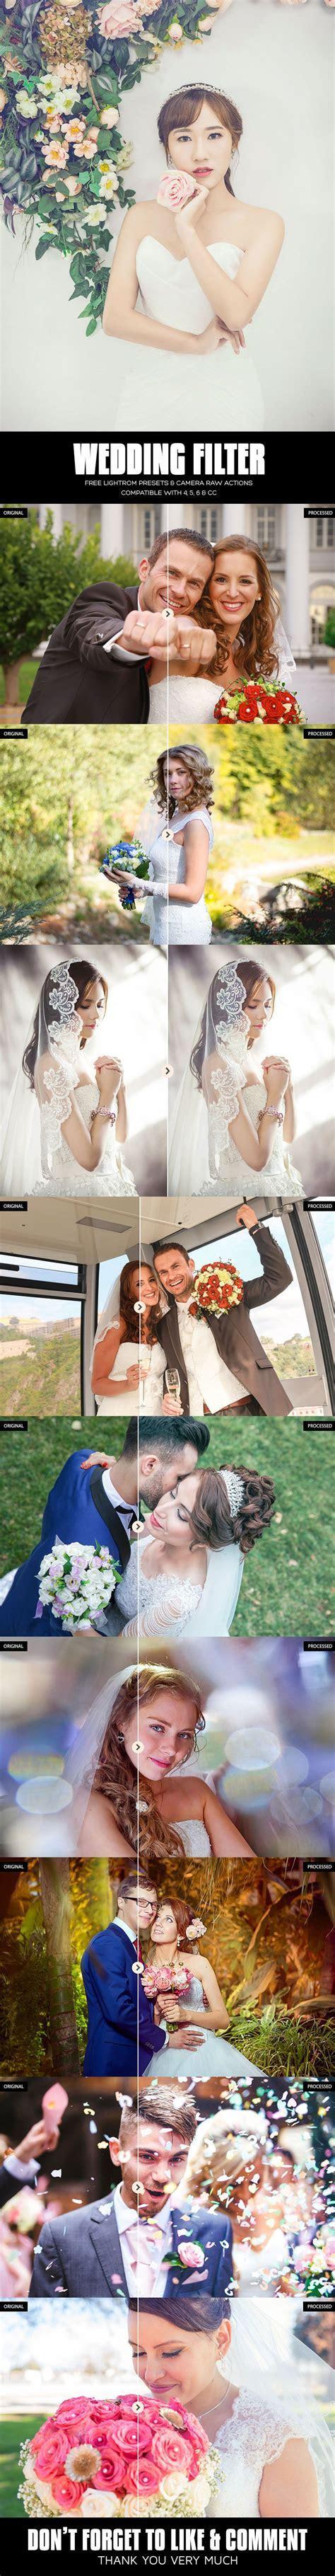 10 Free Wedding Lightroom Presets   Adobe Lightroom